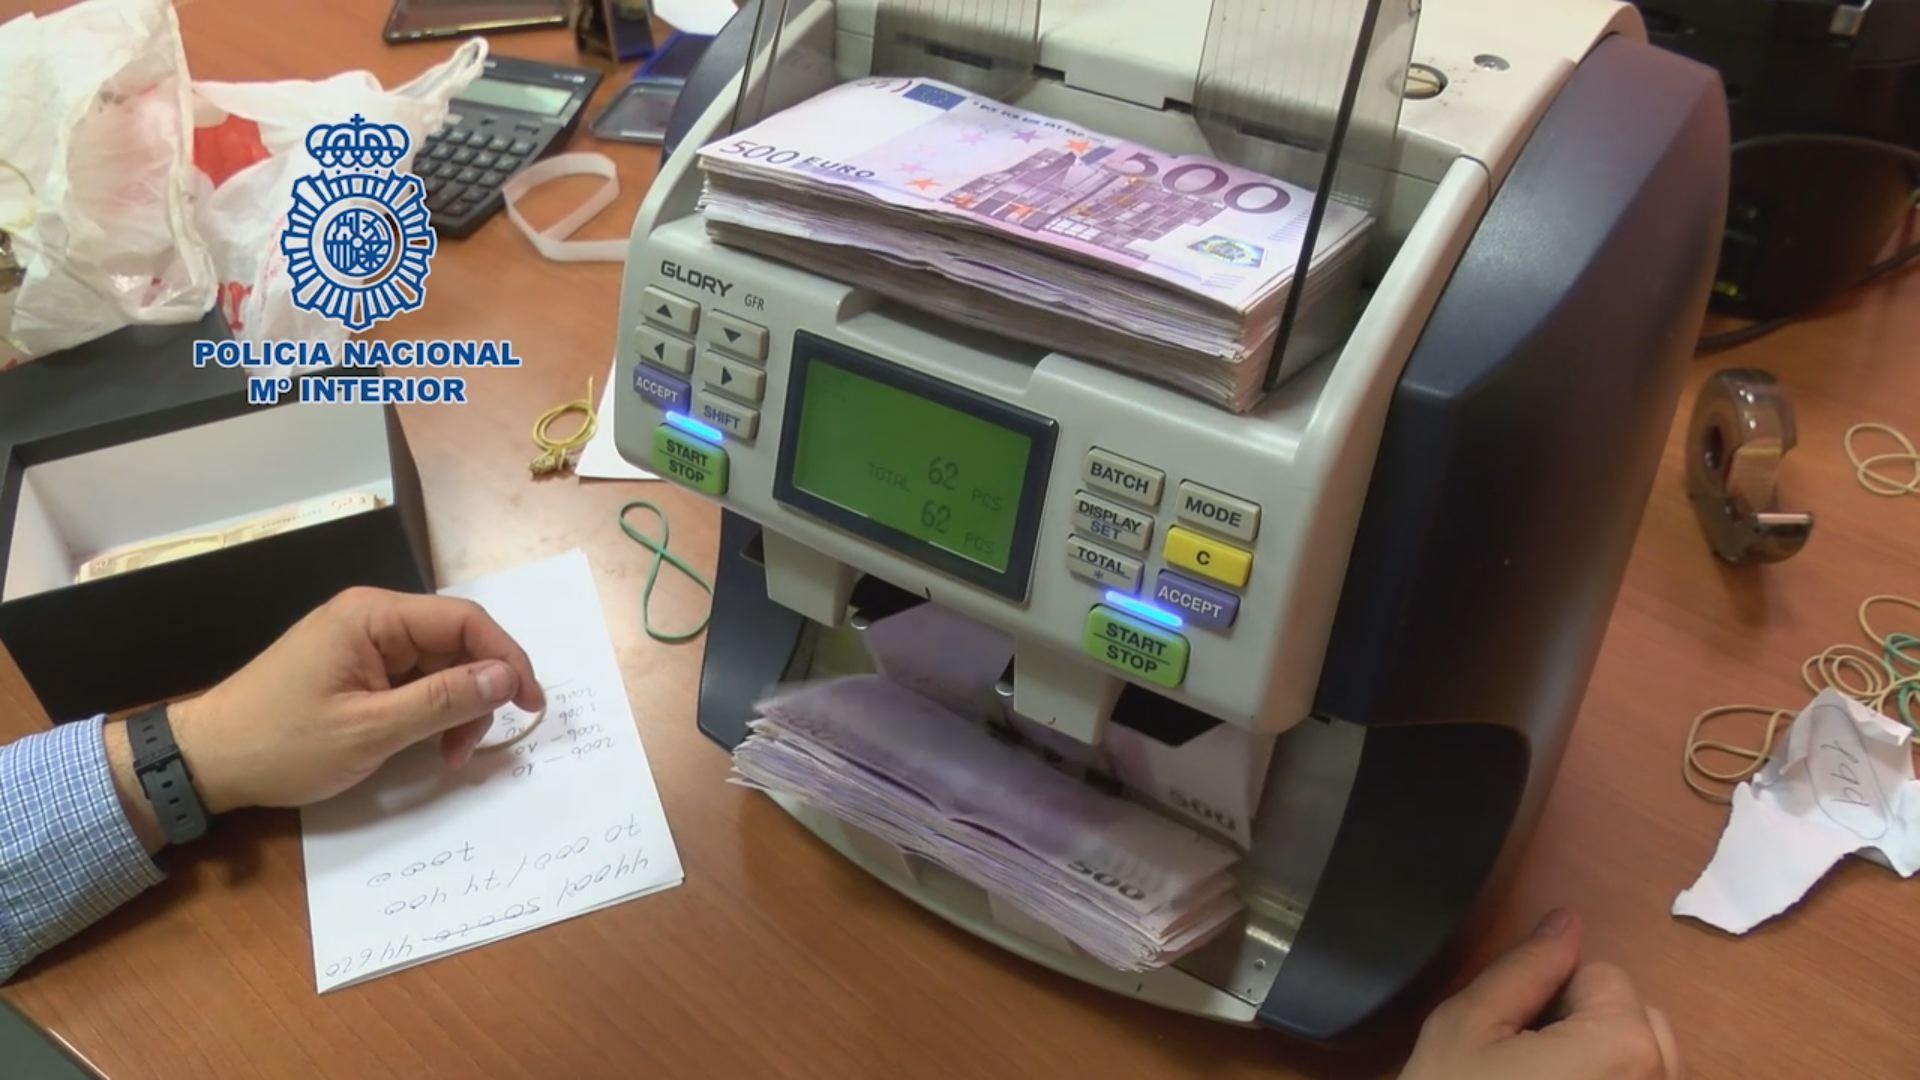 Destapan un fraude a la Seguridad Social de 27,5 millones que afecta a 17 provincias, entre ella